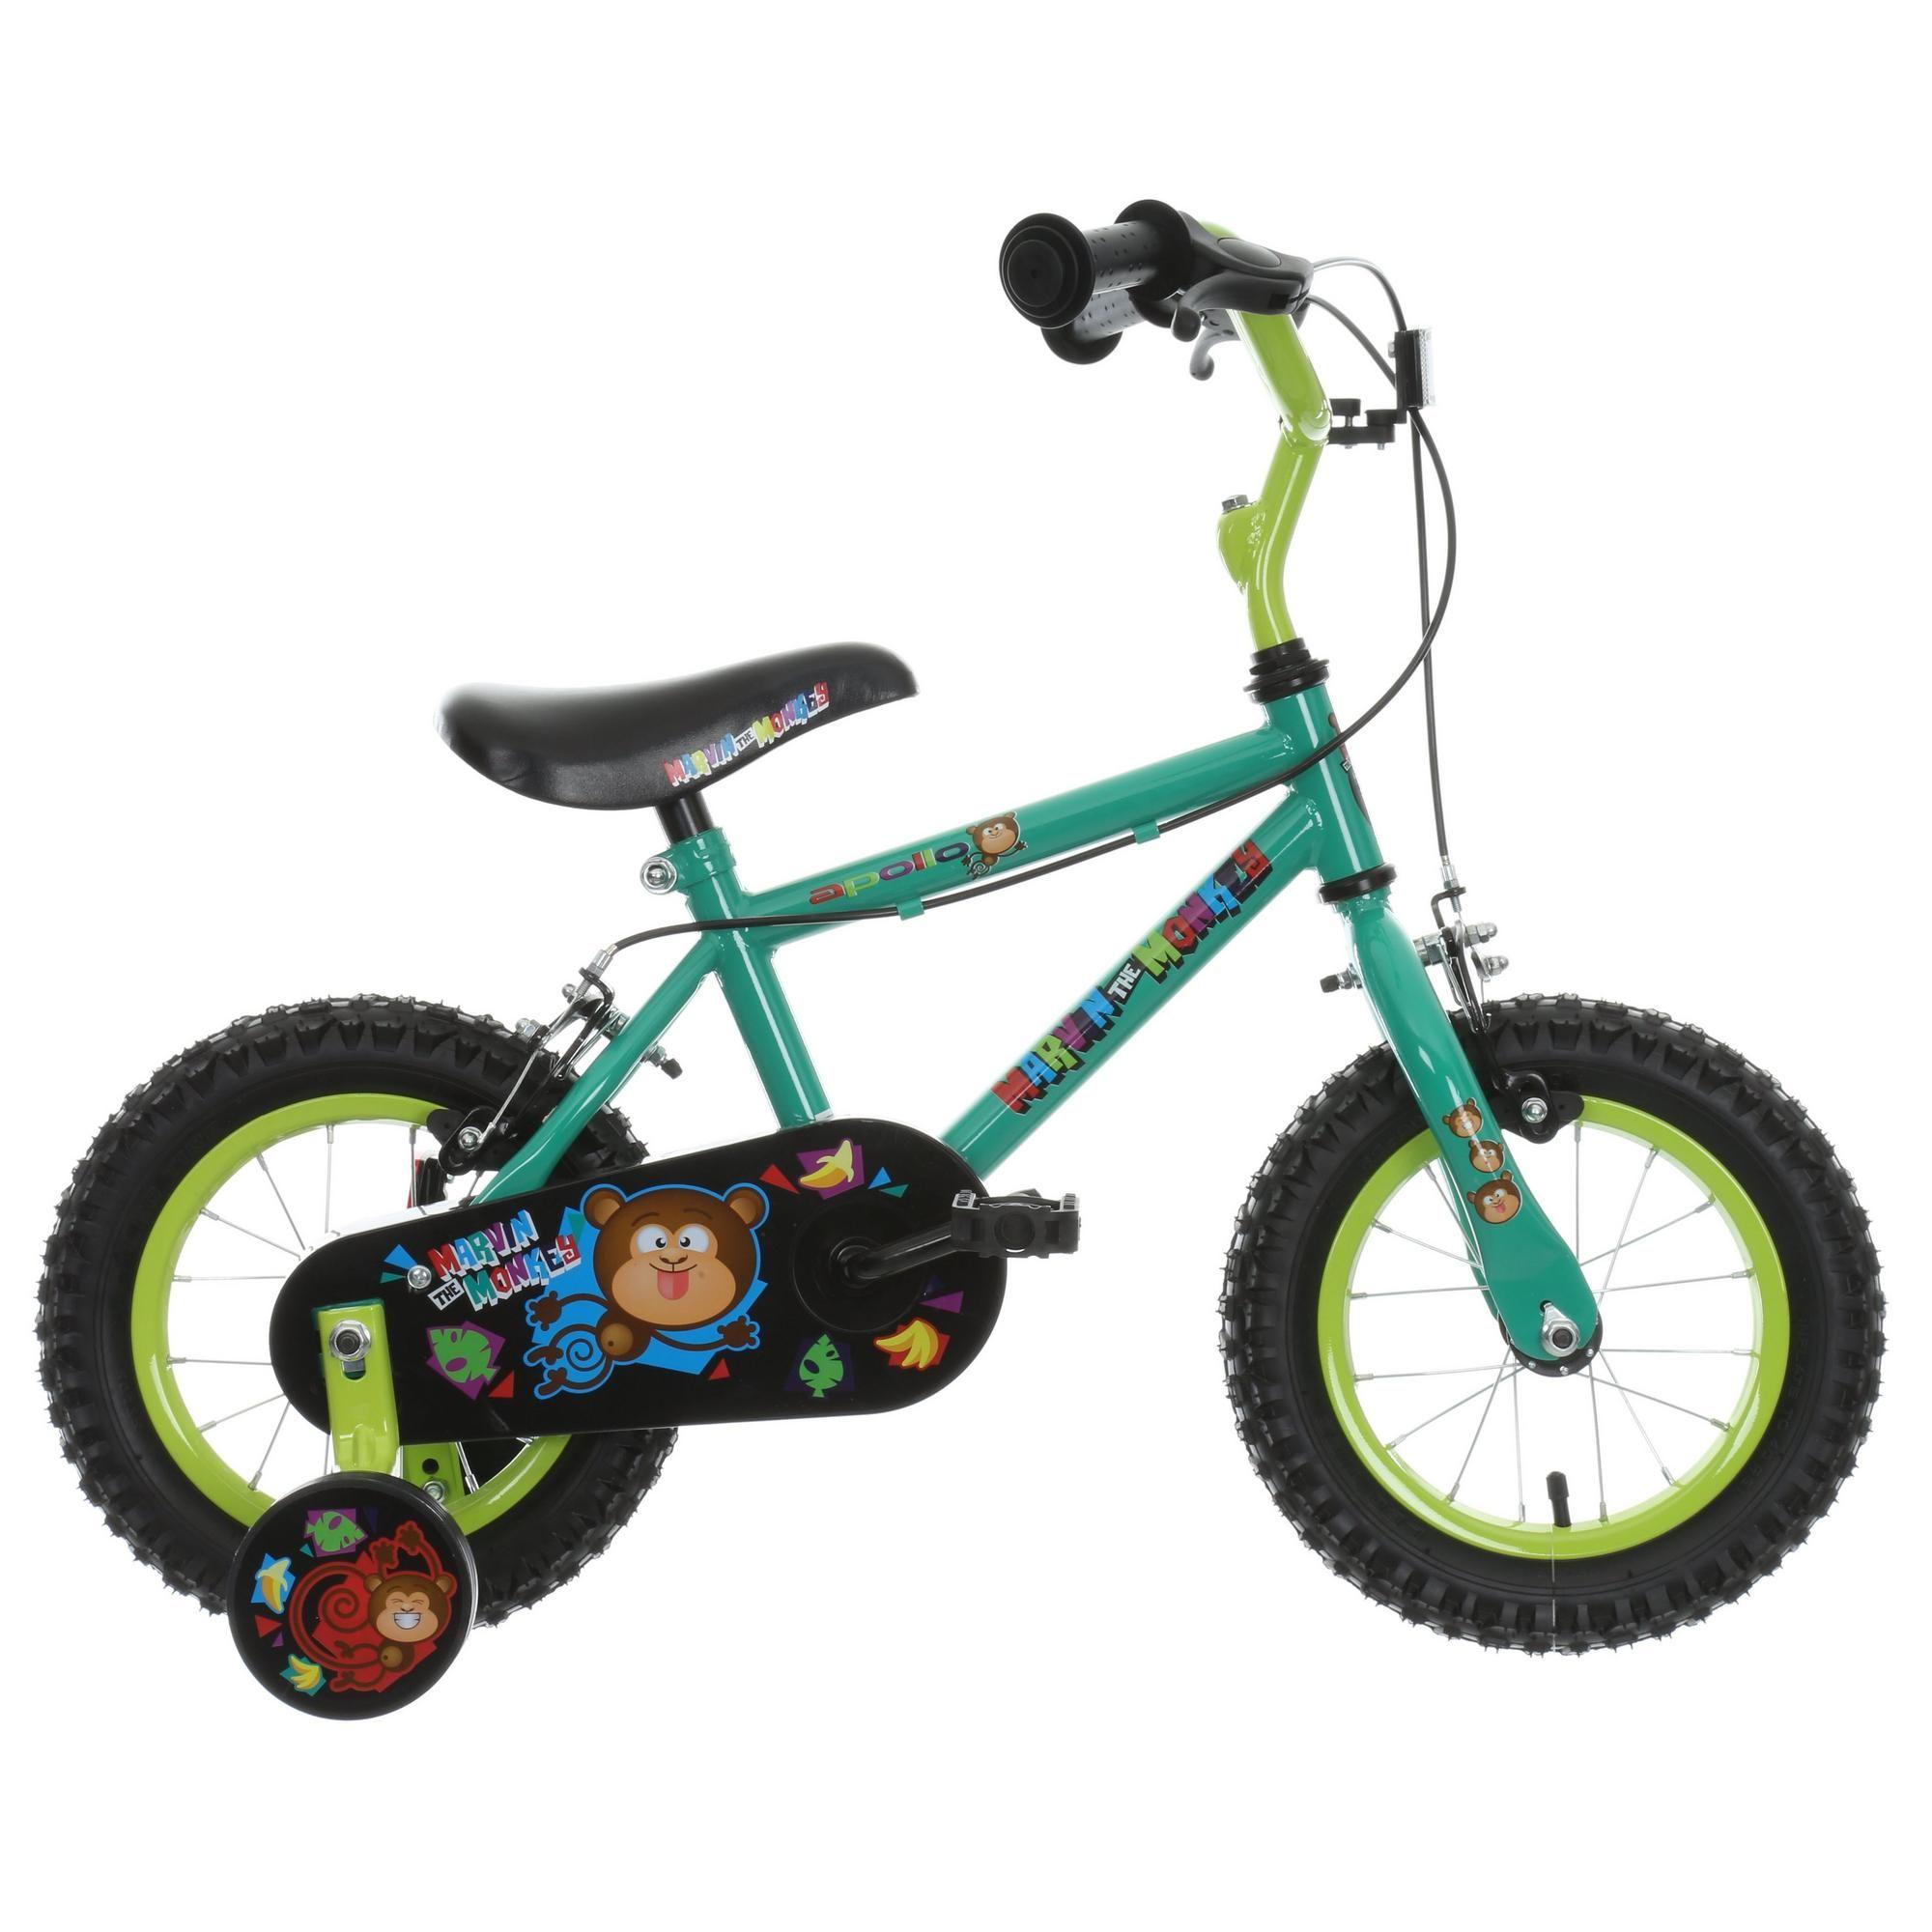 "Halfords Marvin The Monkey Kids Bike - 12"" wheels - £45 @ Halfords"